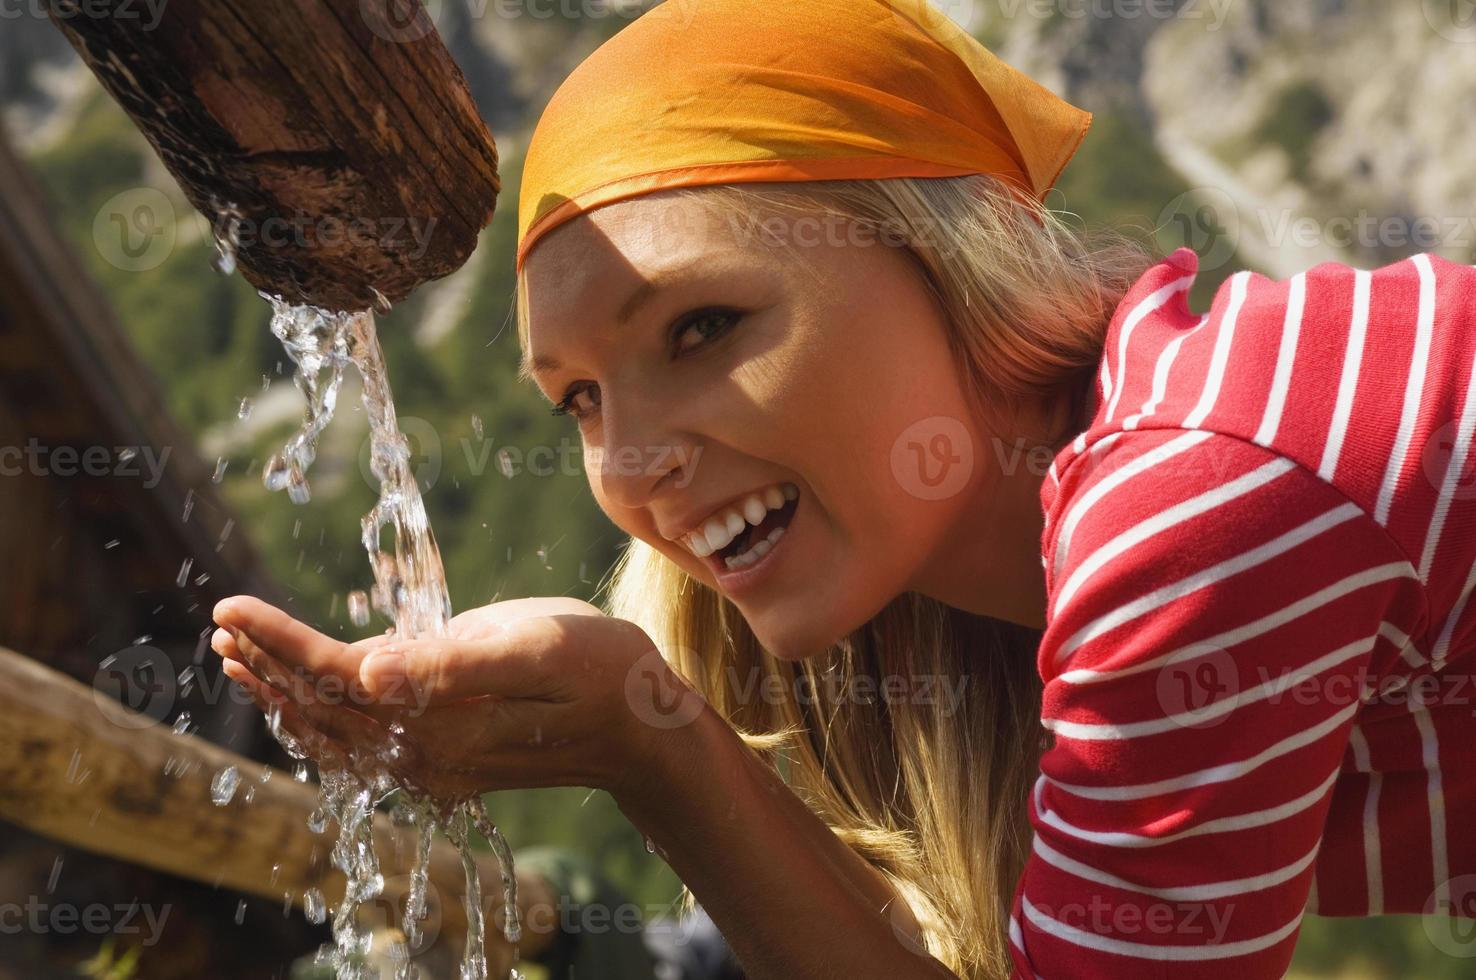 blonde vrouw drinkwater, portret foto